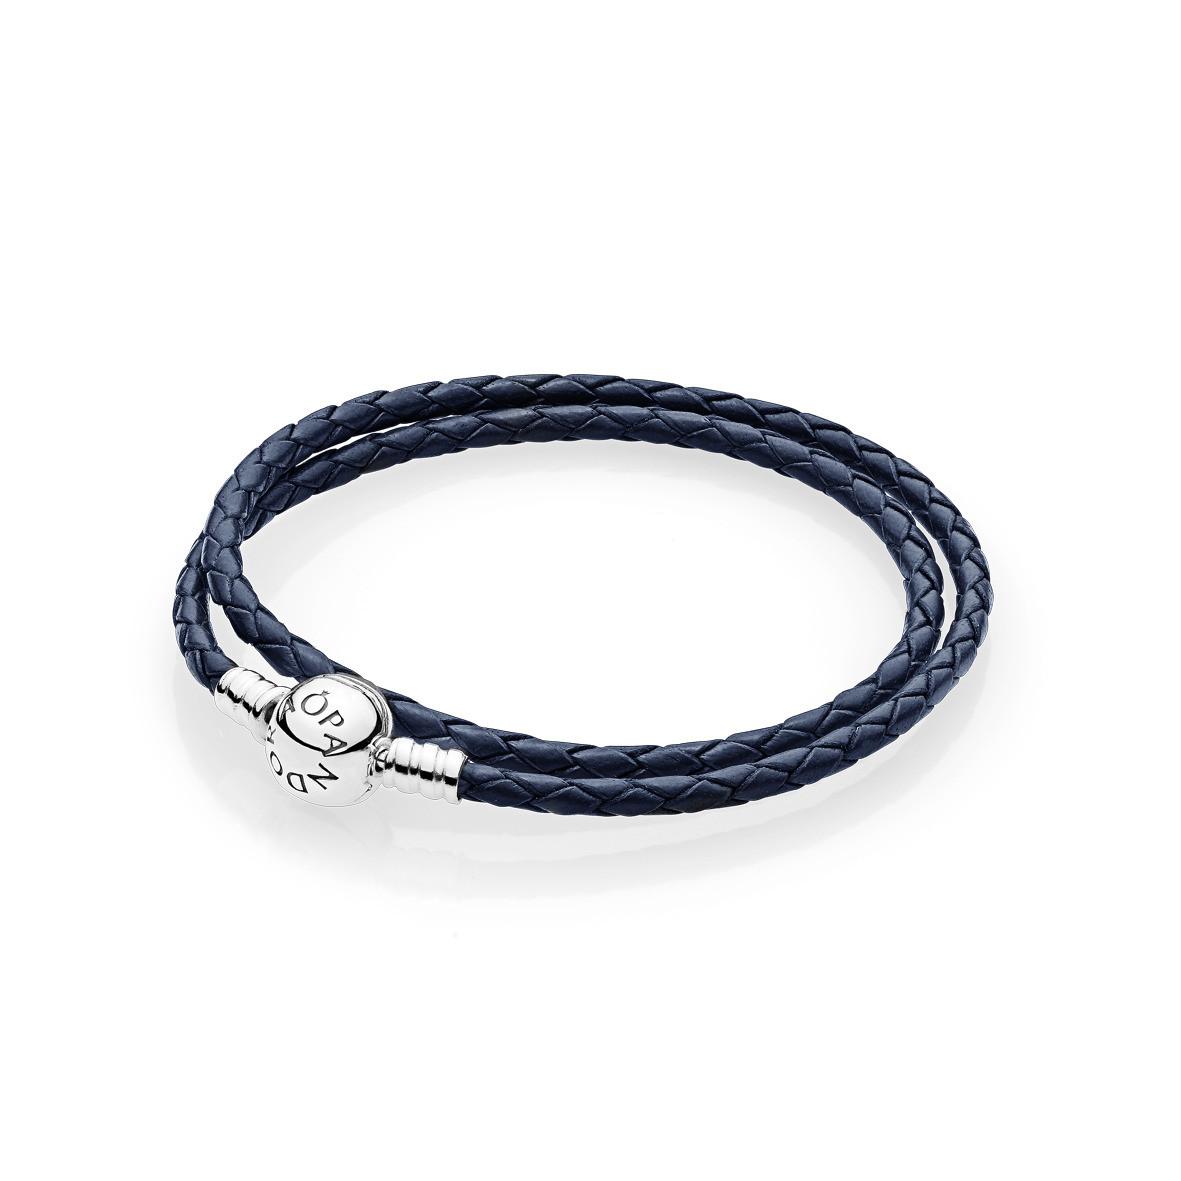 Pulsera Pandora Cuero azul marino